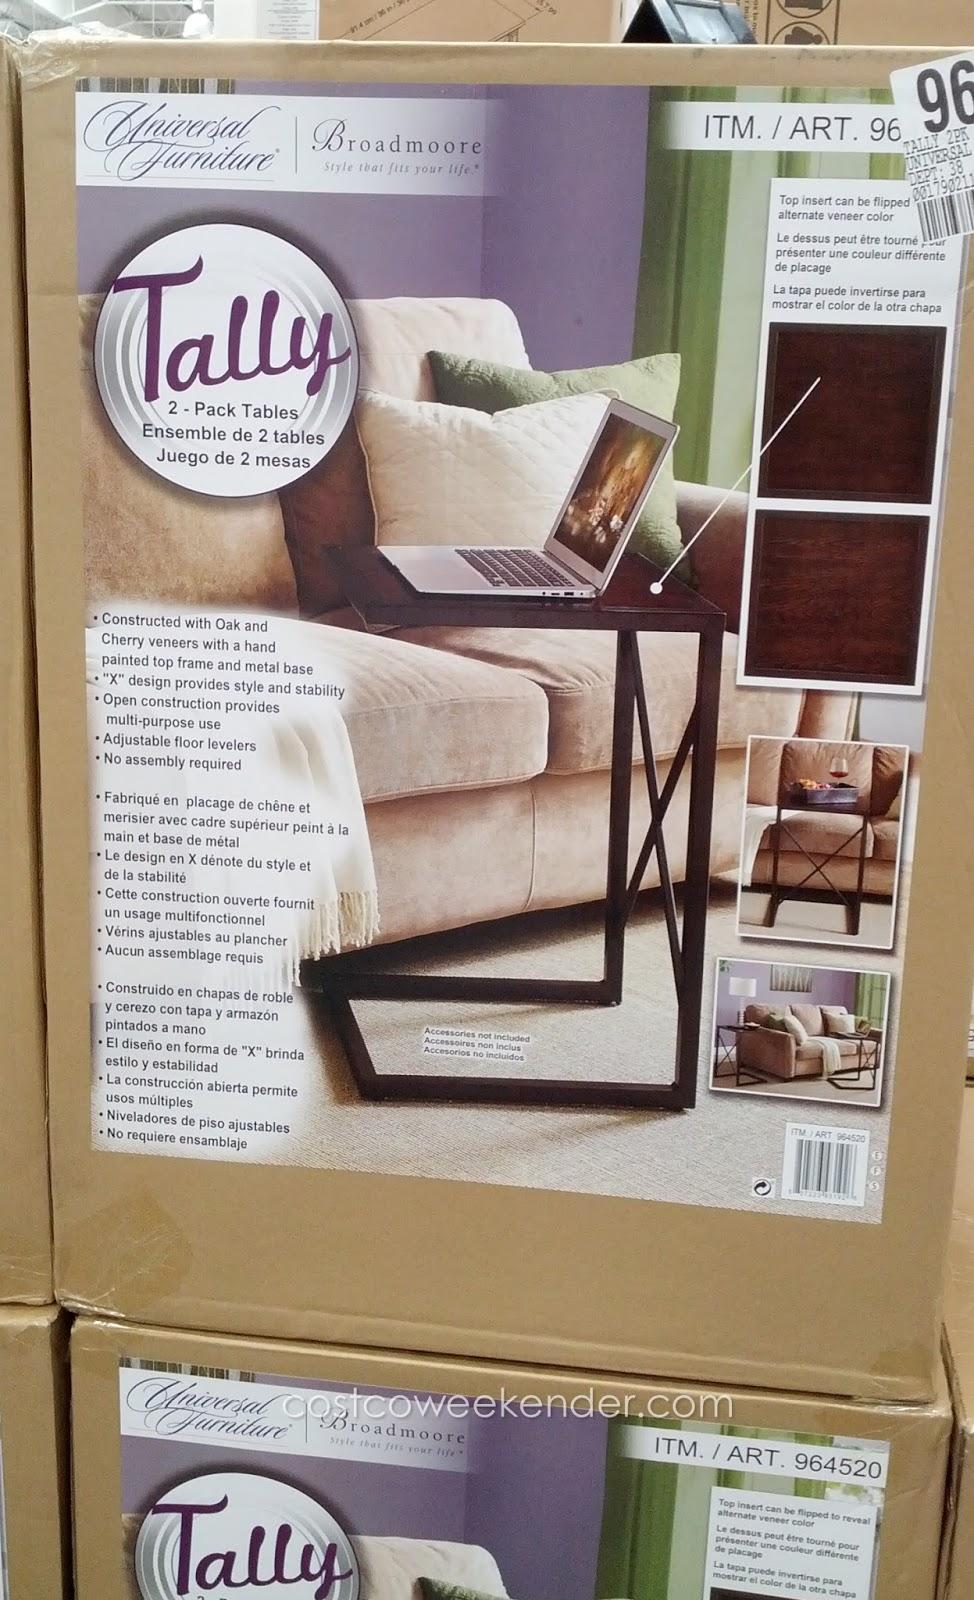 Universal Broadmoore Furniture From Costco Html